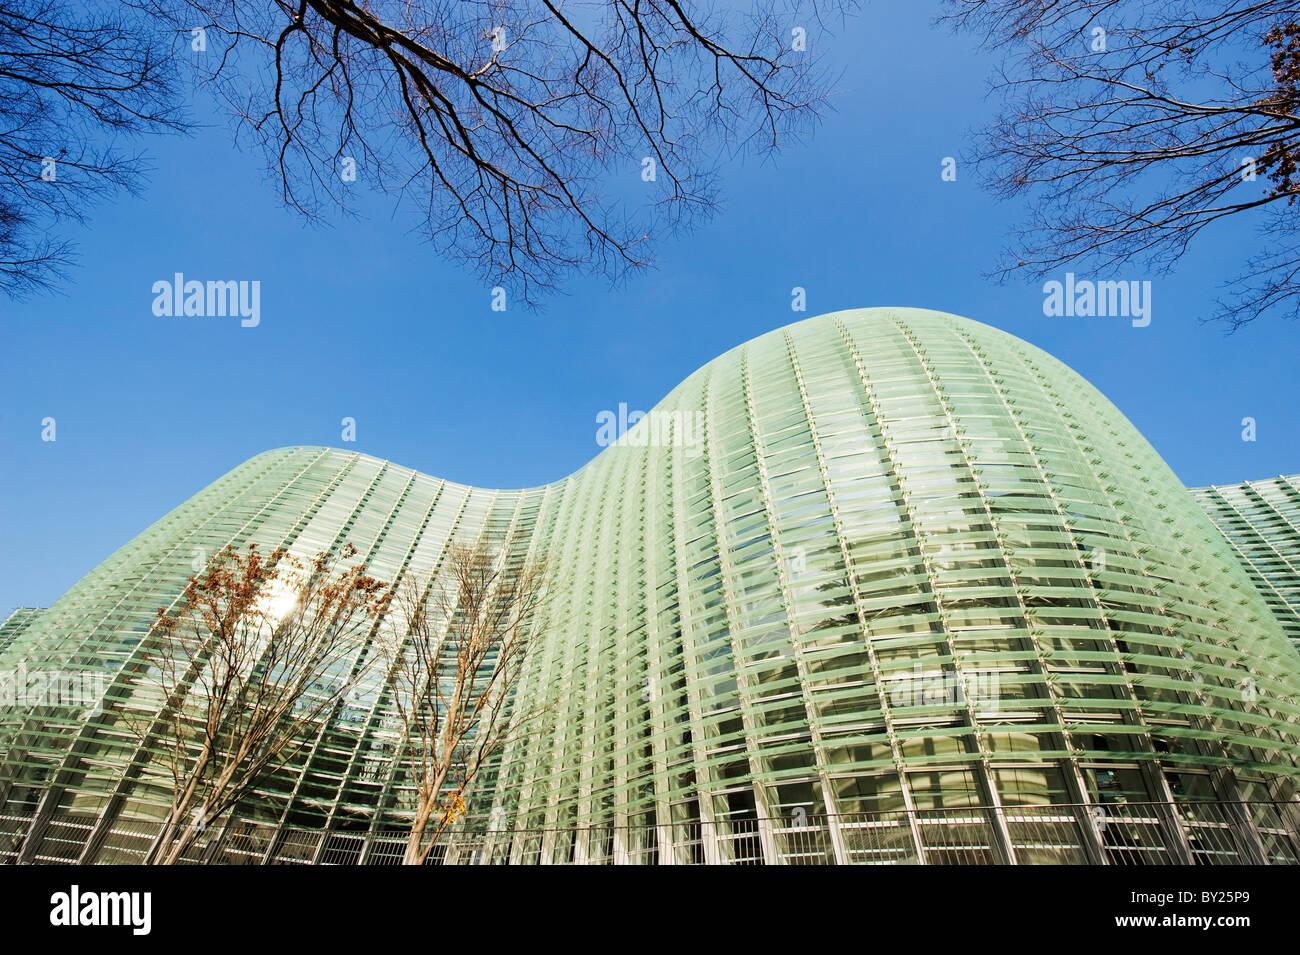 L'Asie, Japon, Tokyo, Roppongi ward, National Art Center, Tokyo Tower, conçue par Kisho Kurokawa (2007) Photo Stock